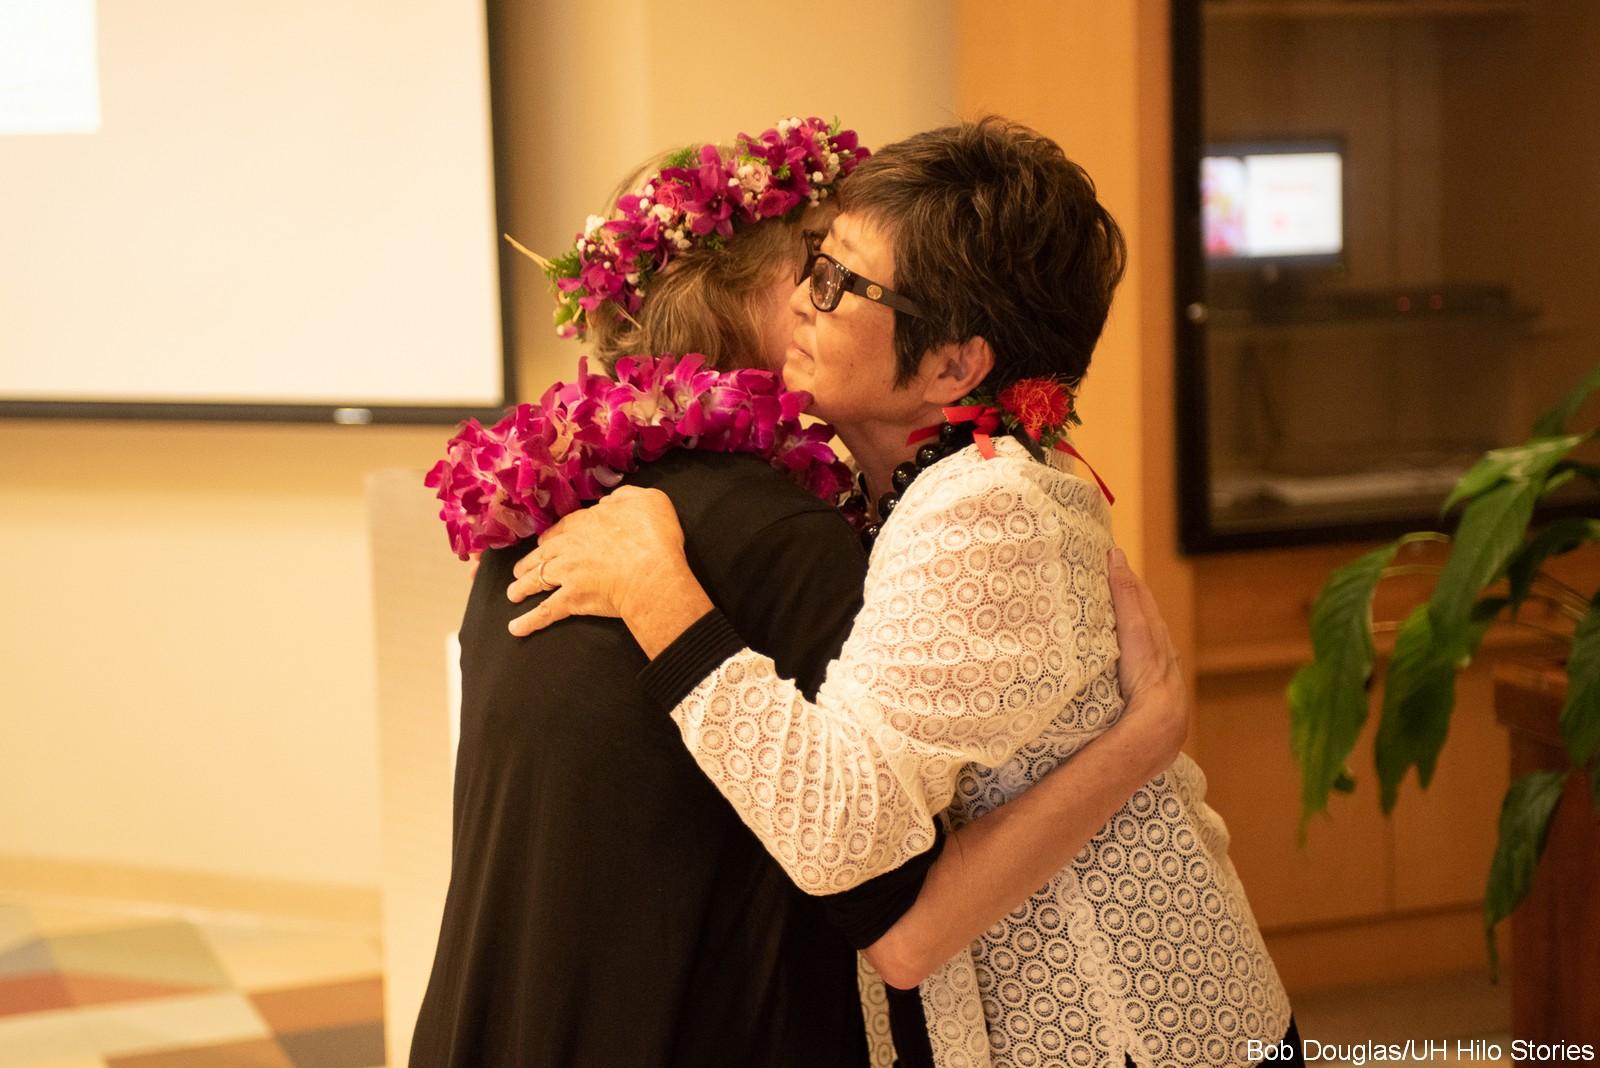 Marcia Sakai hugs Jennifer Doudna.